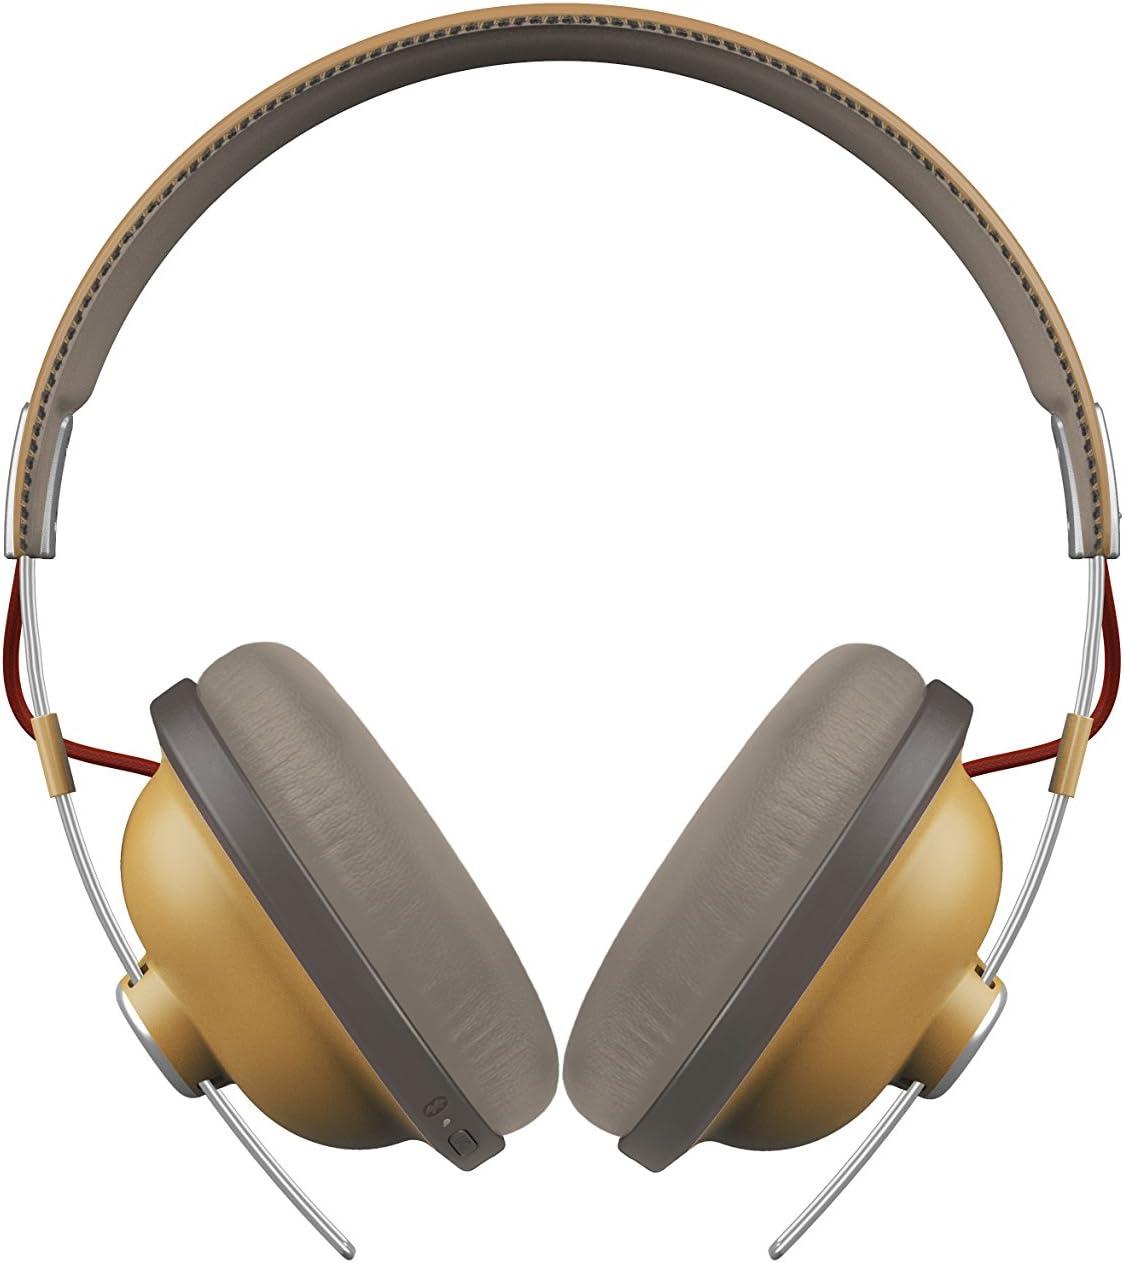 Panasonic RP-HTX80BE-C Auriculares Bluetooth Diadema (24h de Reproducción, Micrófono y Manos Libres, Hi-Fi Sonido, Cascos Inalámbricos, Carga Rápida, Cascos Diadema Premium Móviles, TV, PC), Ocre